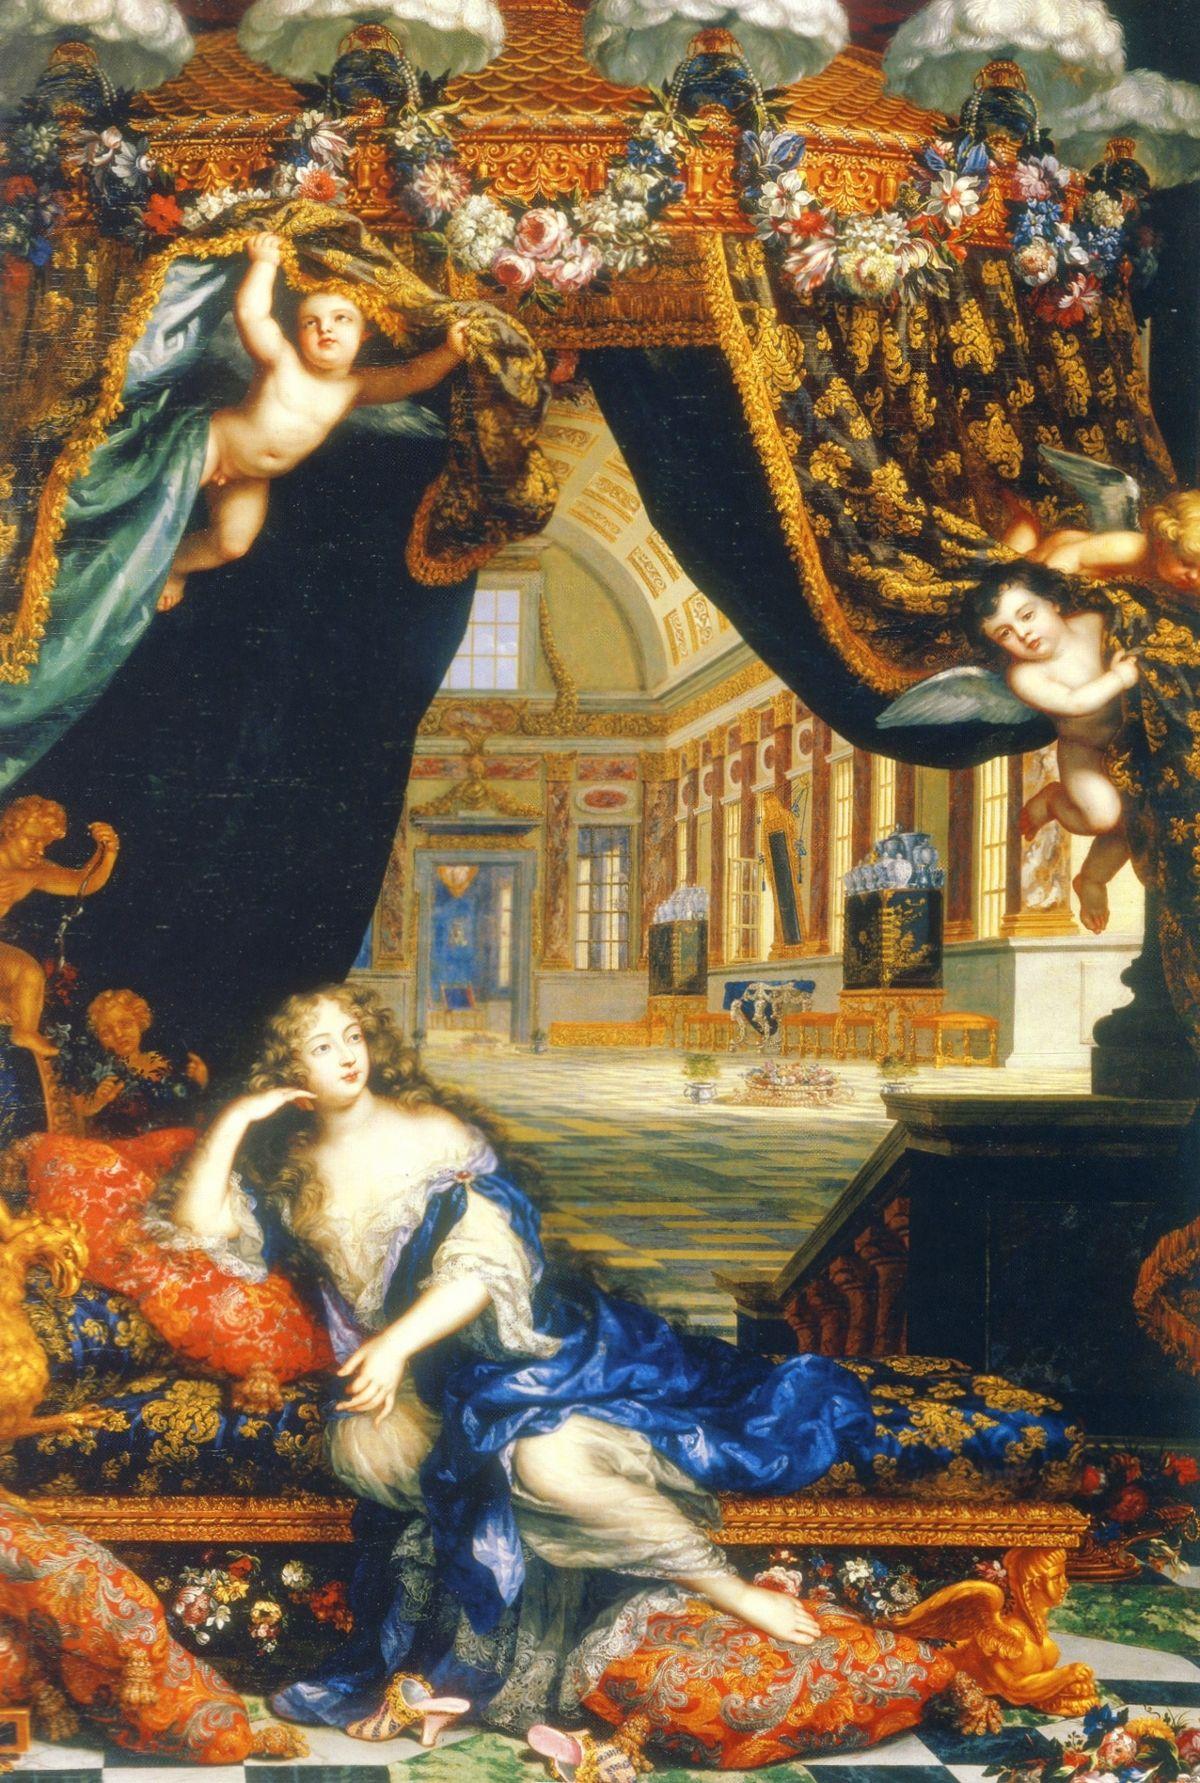 Секс царя и фавориток 16 фотография